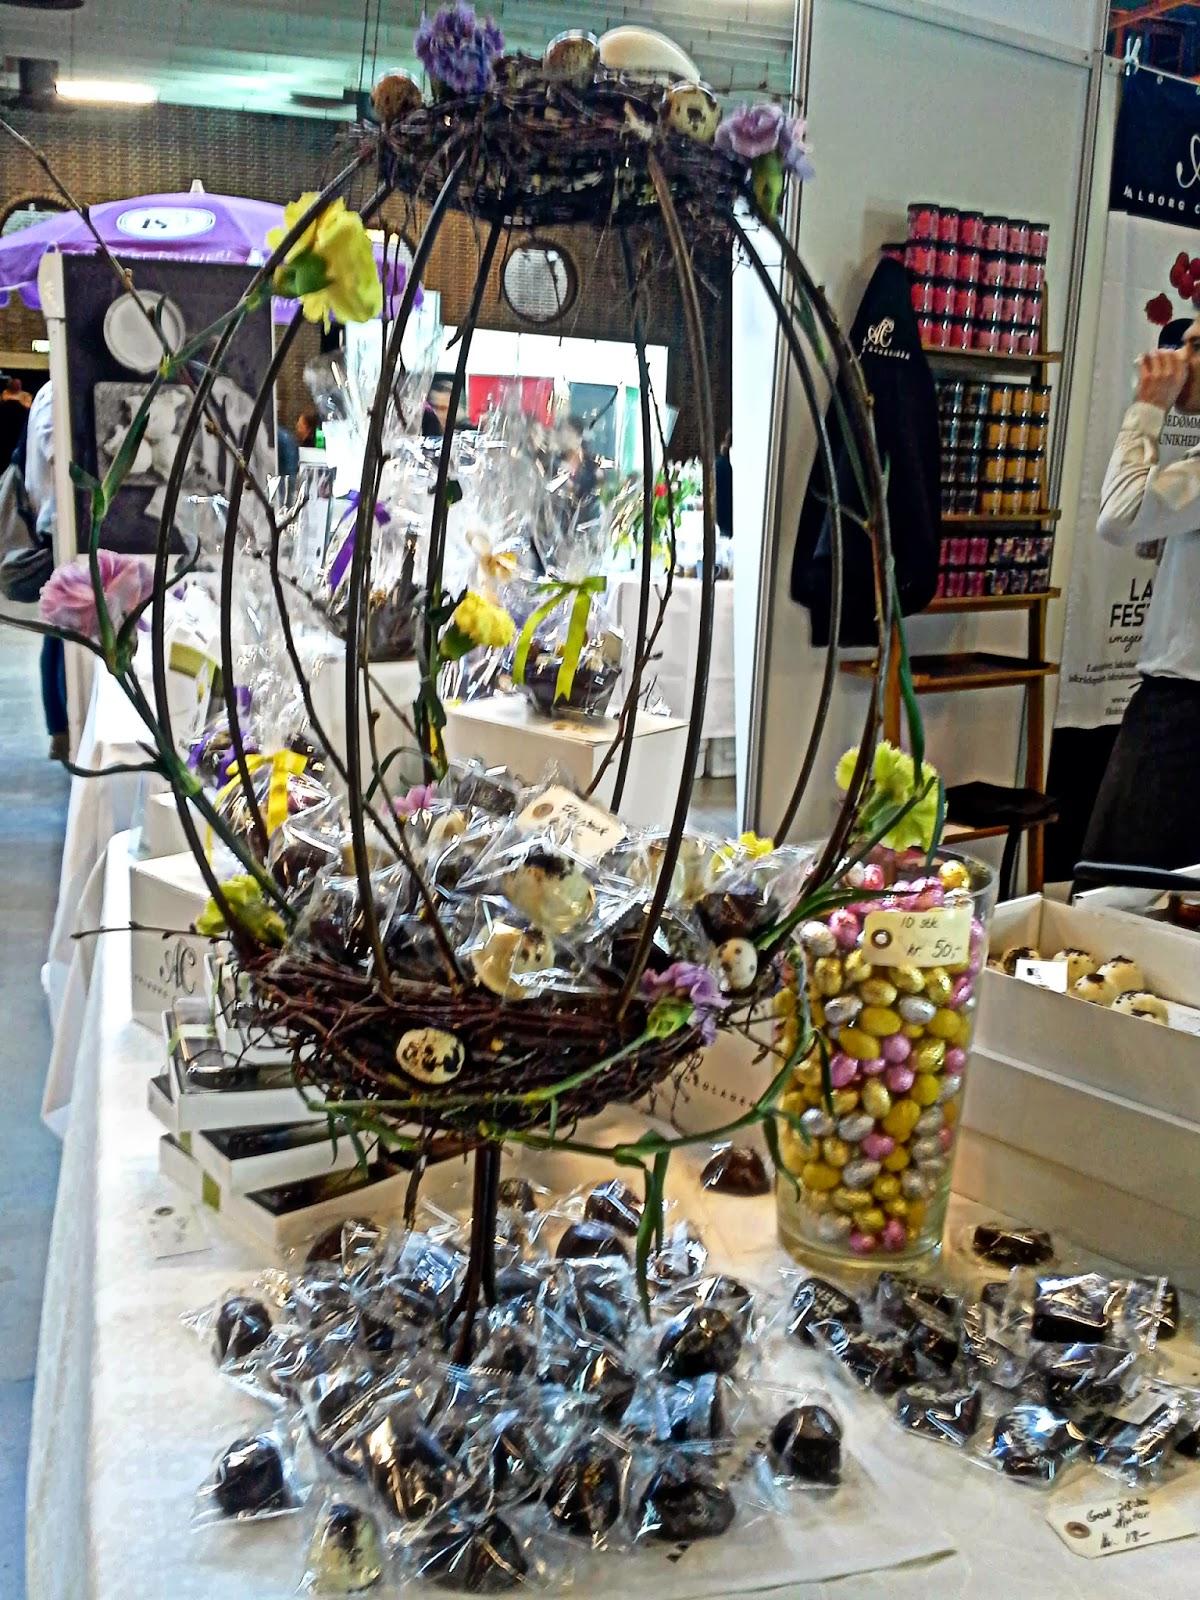 http://cupcakeluvs.blogspot.dk/2014/03/chokolade-festivel-2014-chocolate.html